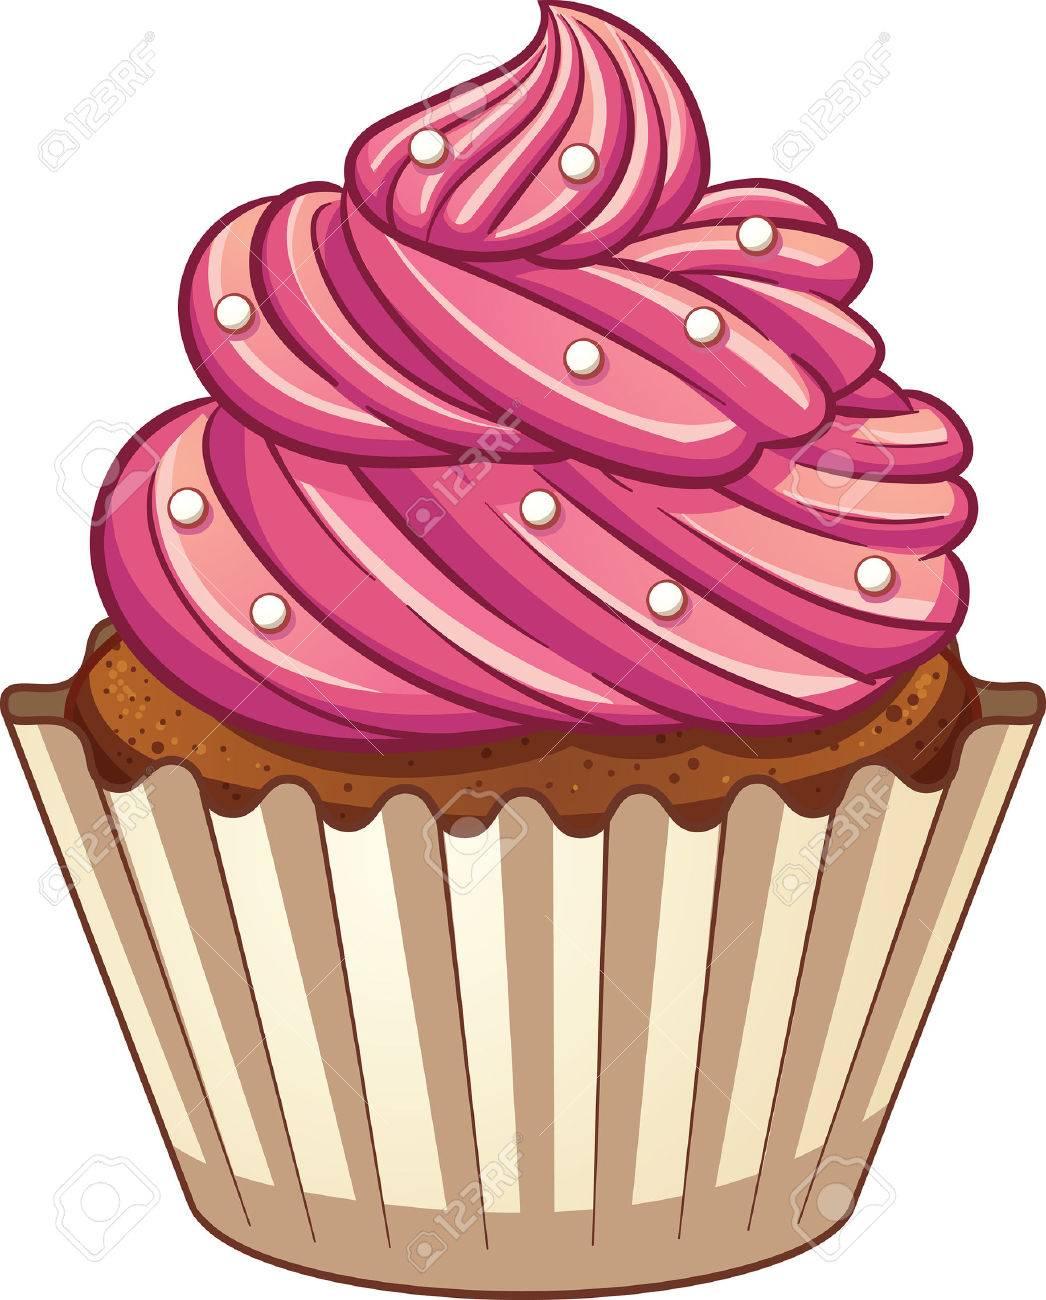 Cartoon cupcake. clip art illustration with simple gradients.